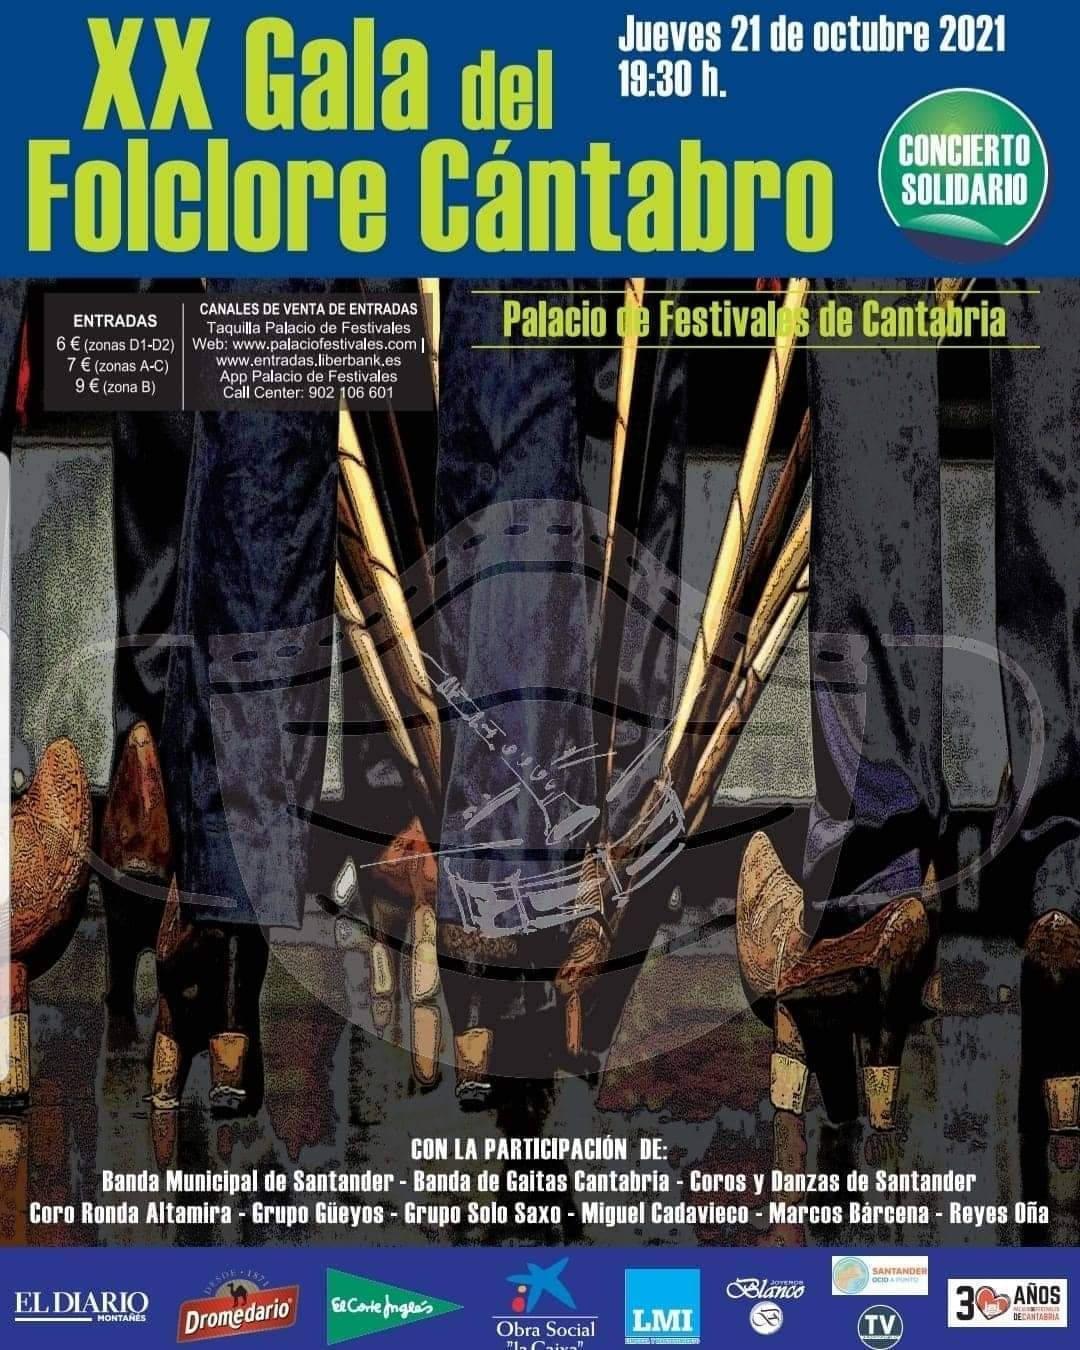 XX Gala del Folklore Cántabro